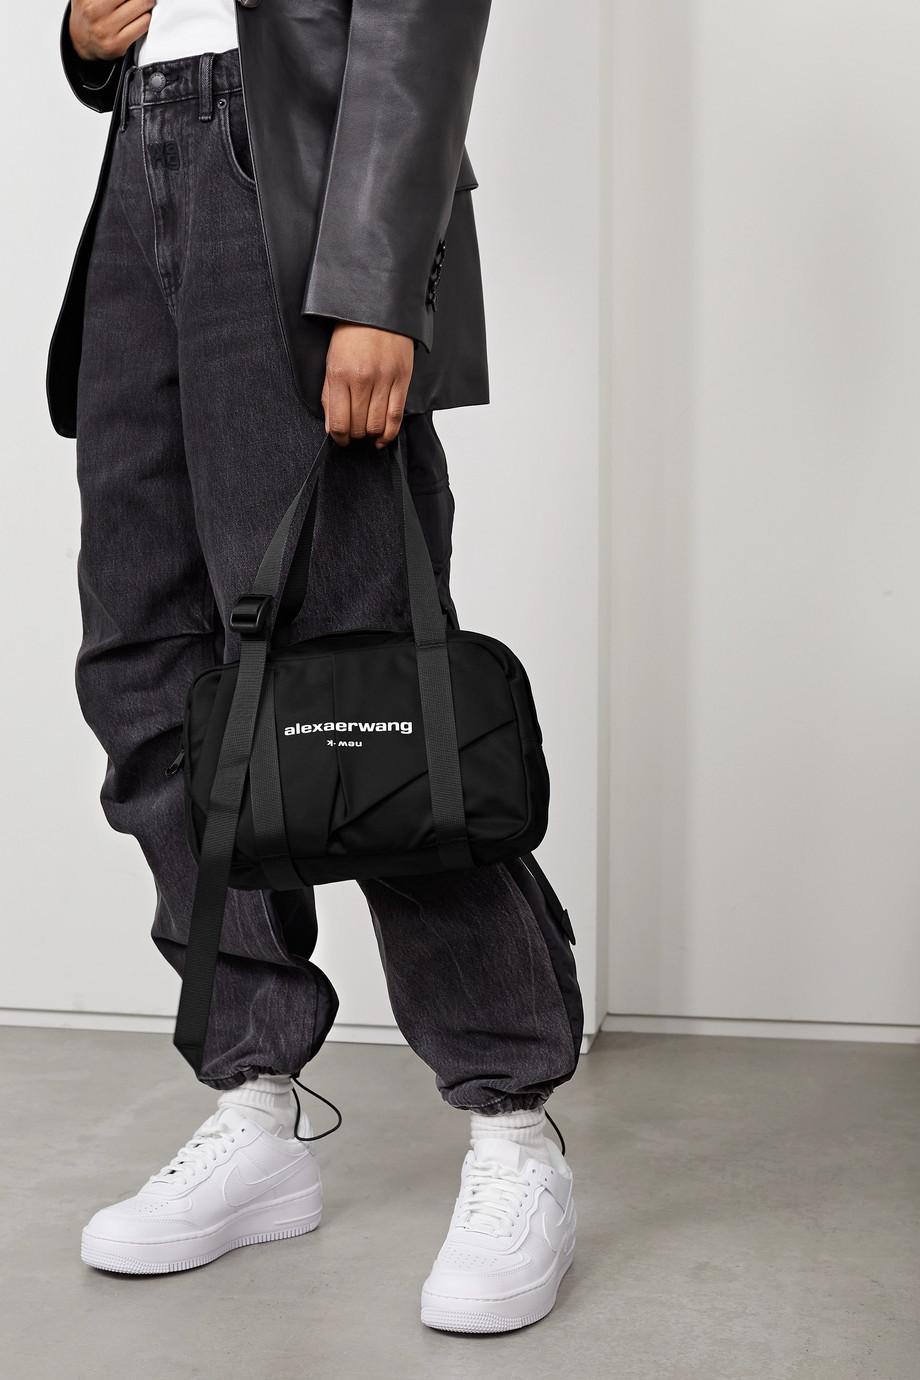 Alexander Wang Wangsport mittelgroße Tote aus Nylon mit Print